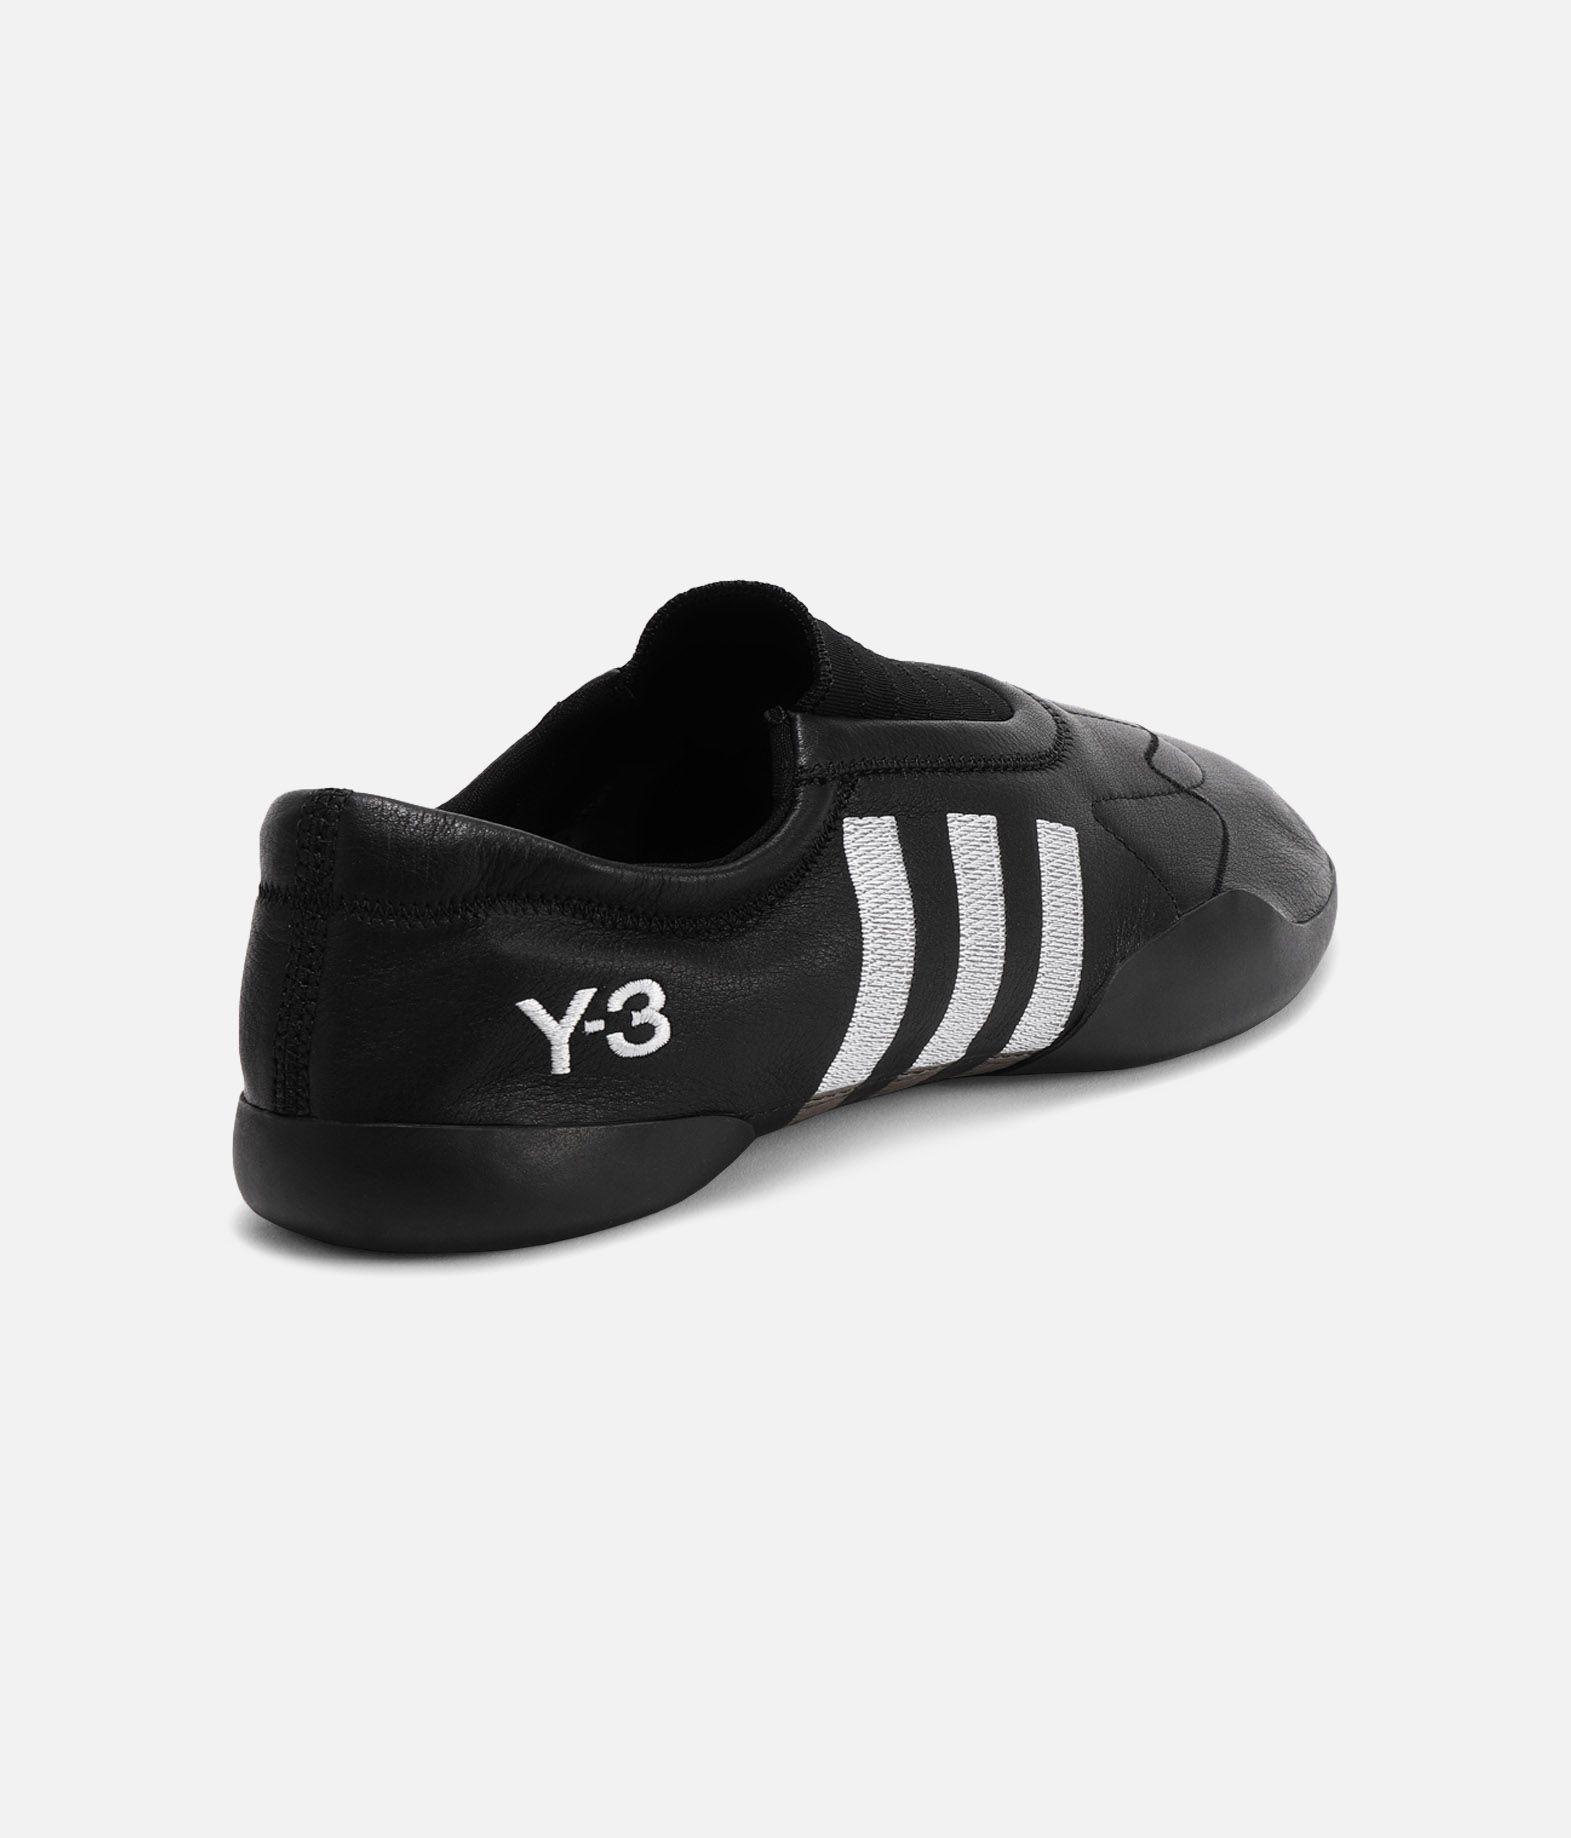 Y-3 Y-3 Taekwondo Sneakers Woman d